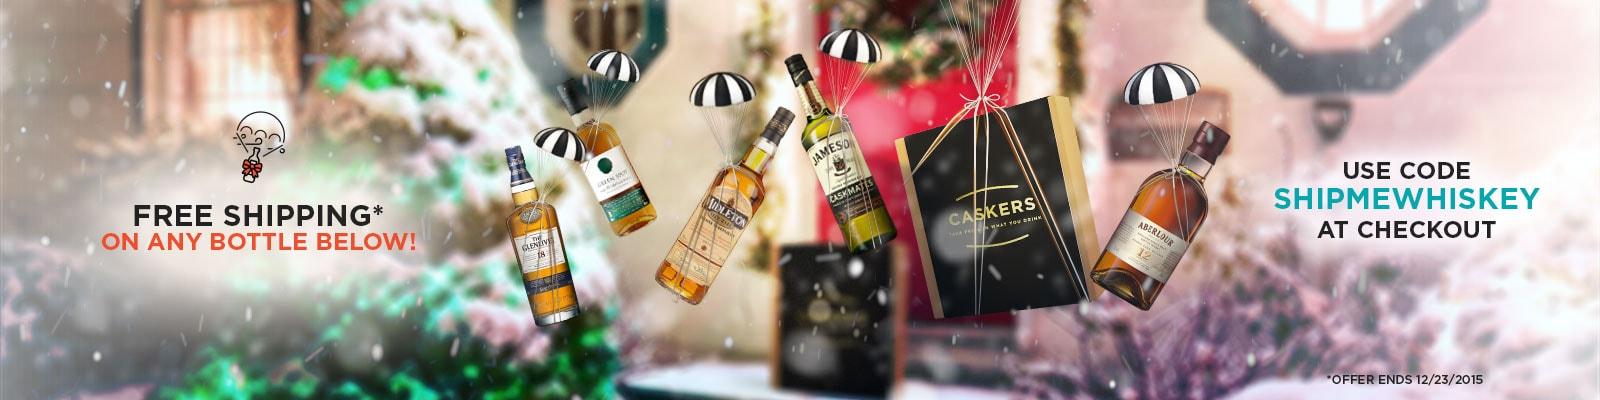 PRUSA - Holiday Free Shipping Bottles